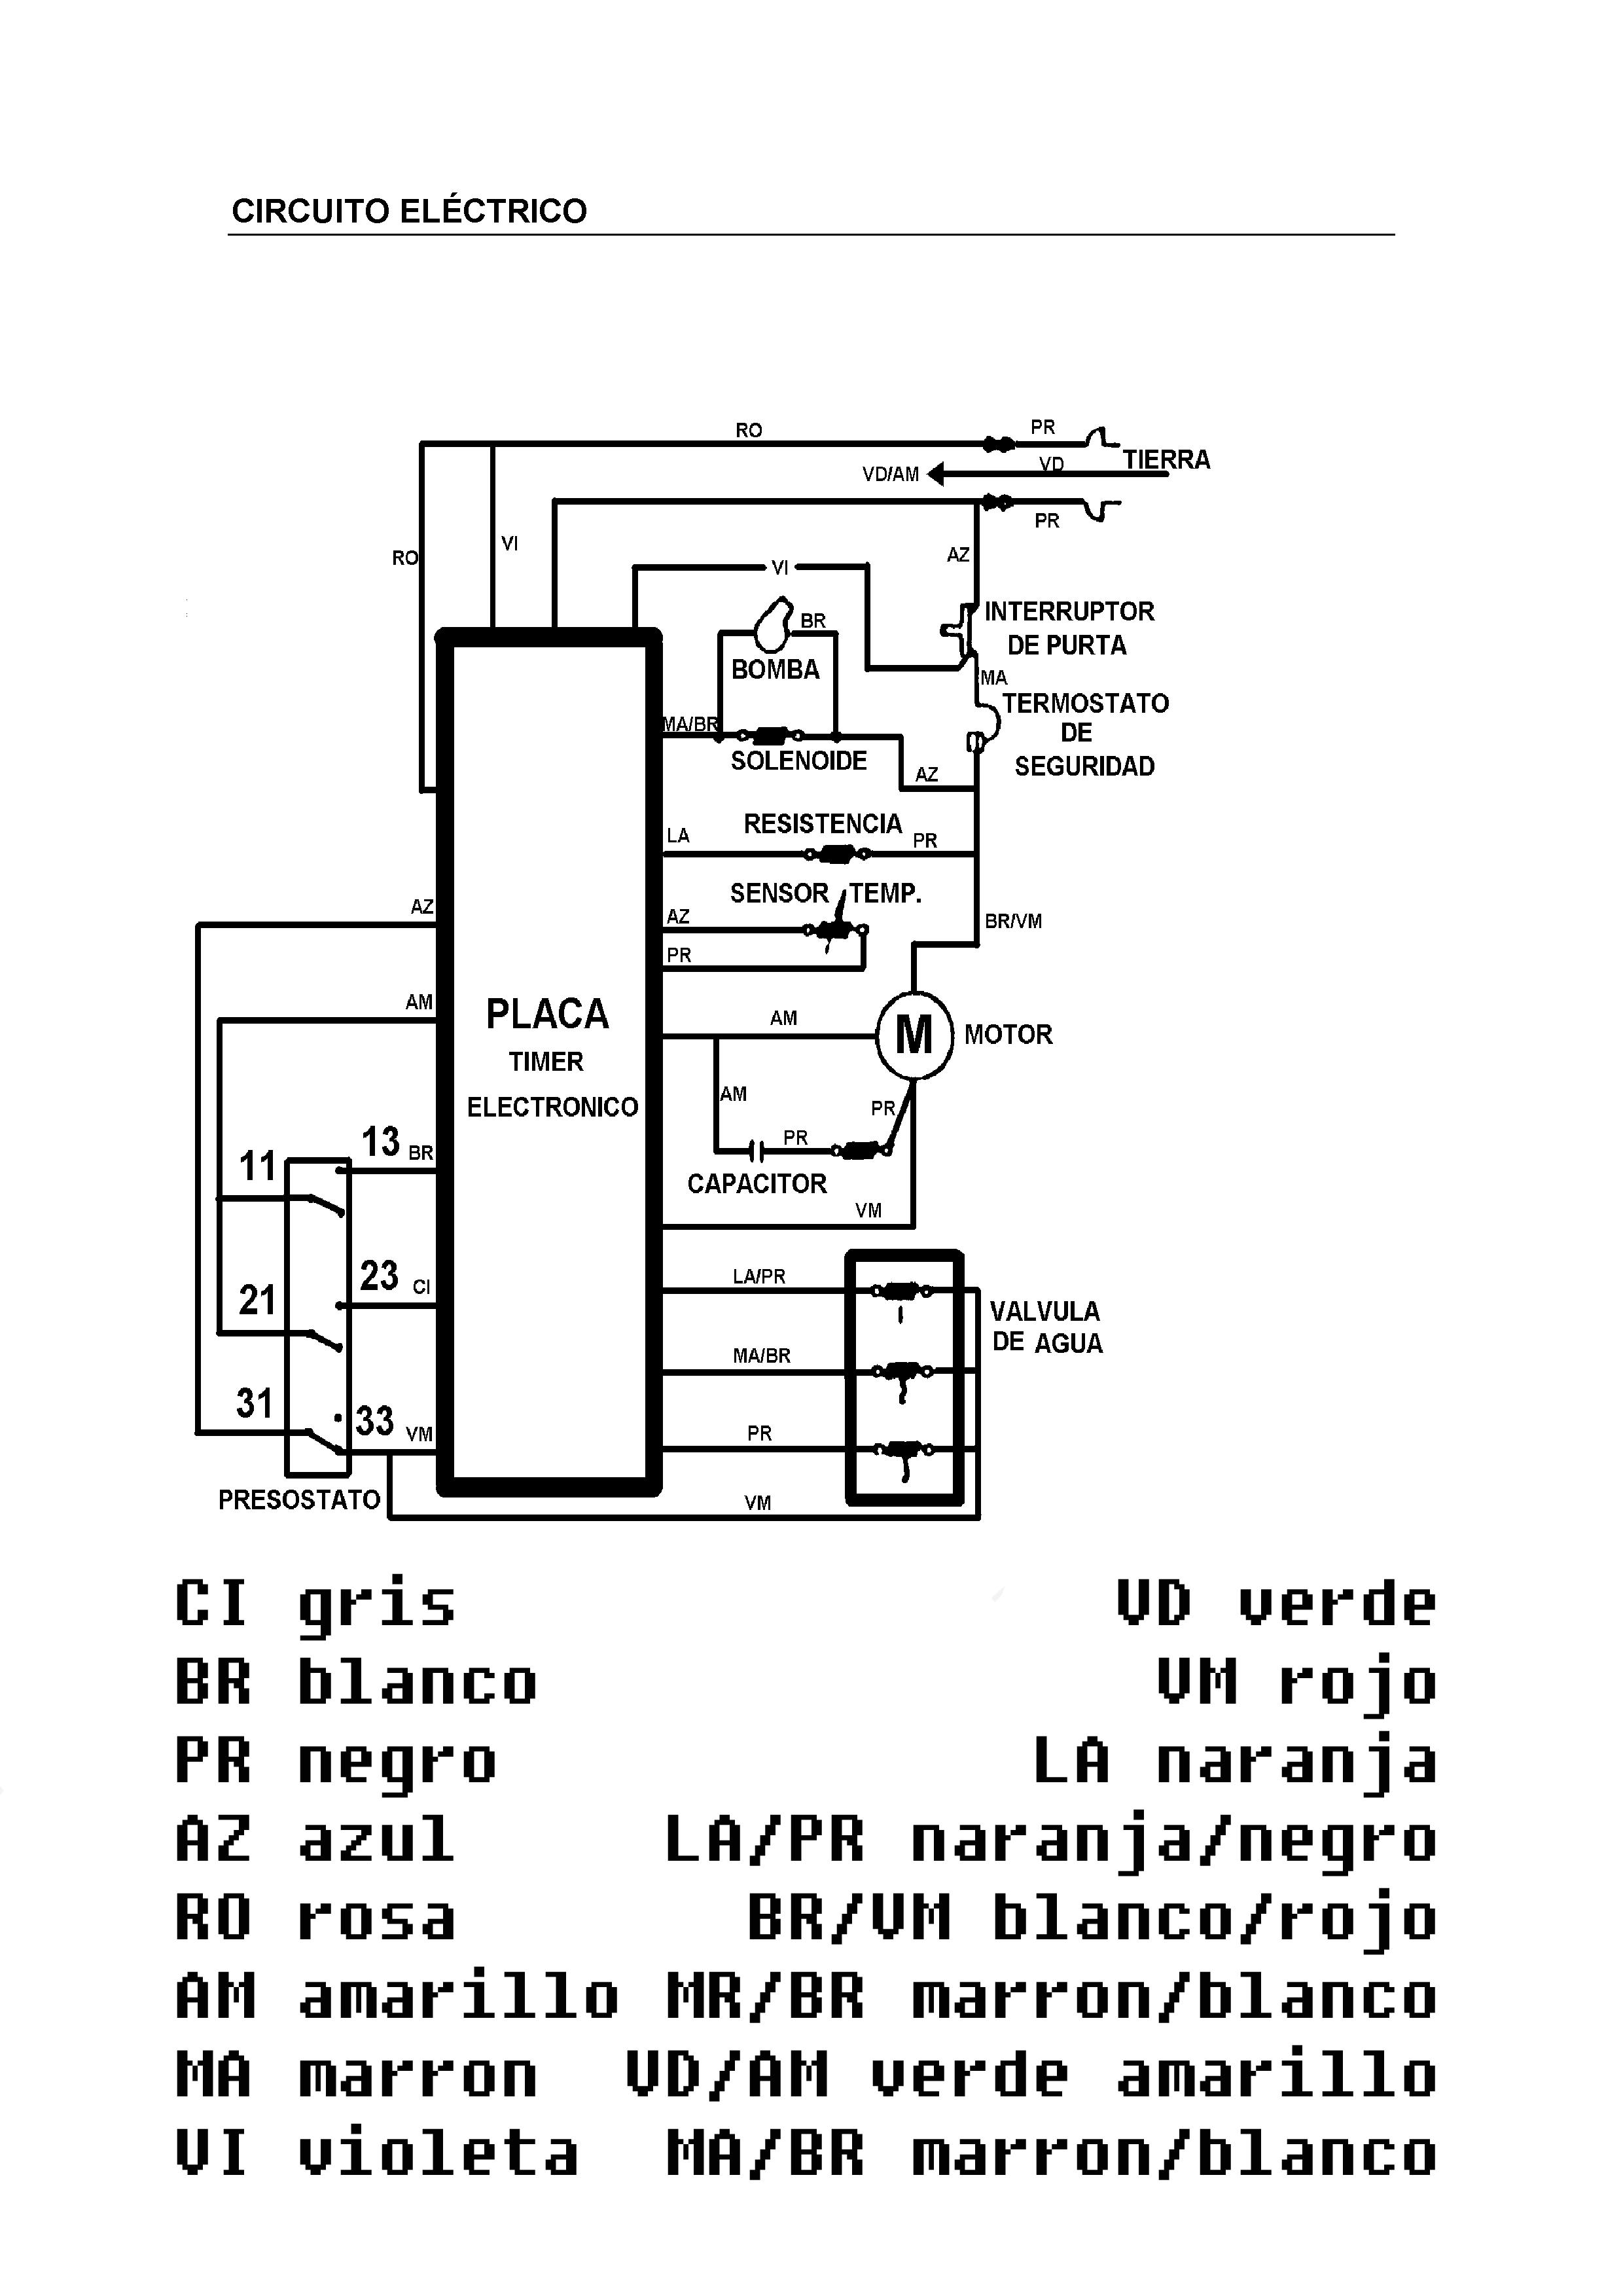 awr680.jpg